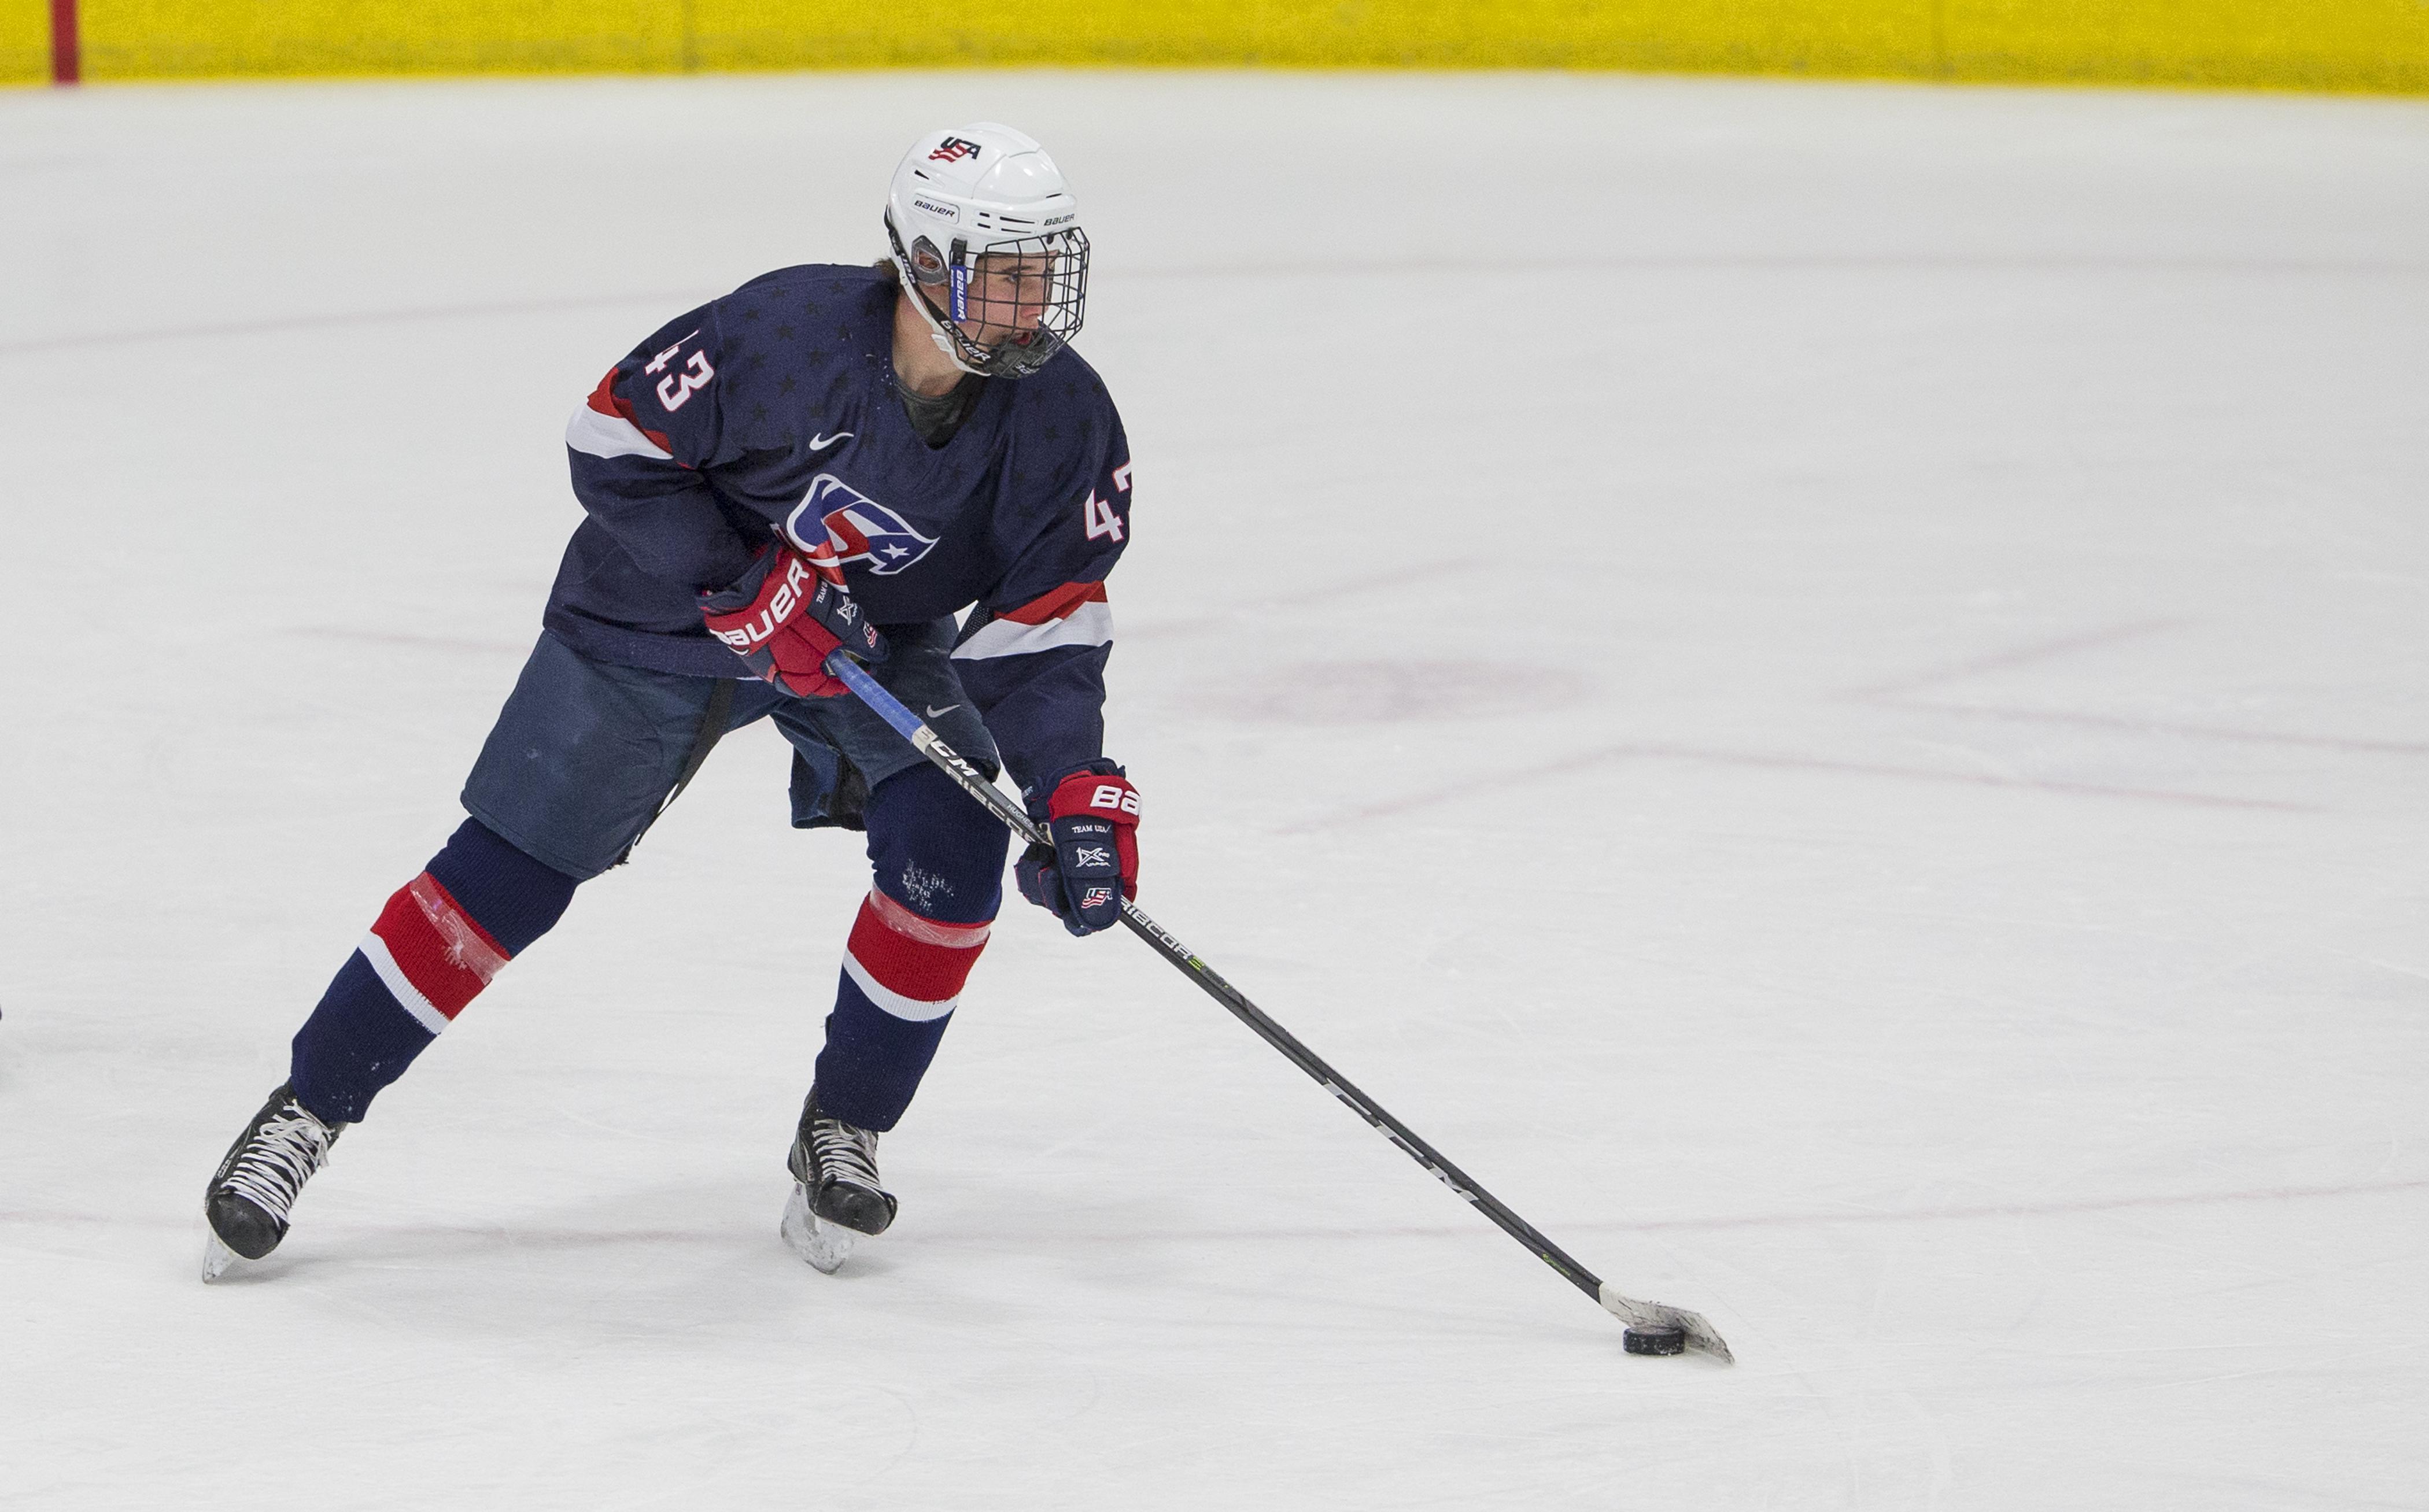 USHL: Hughes Scores Late To Push U18s Past Chicago, 4-3